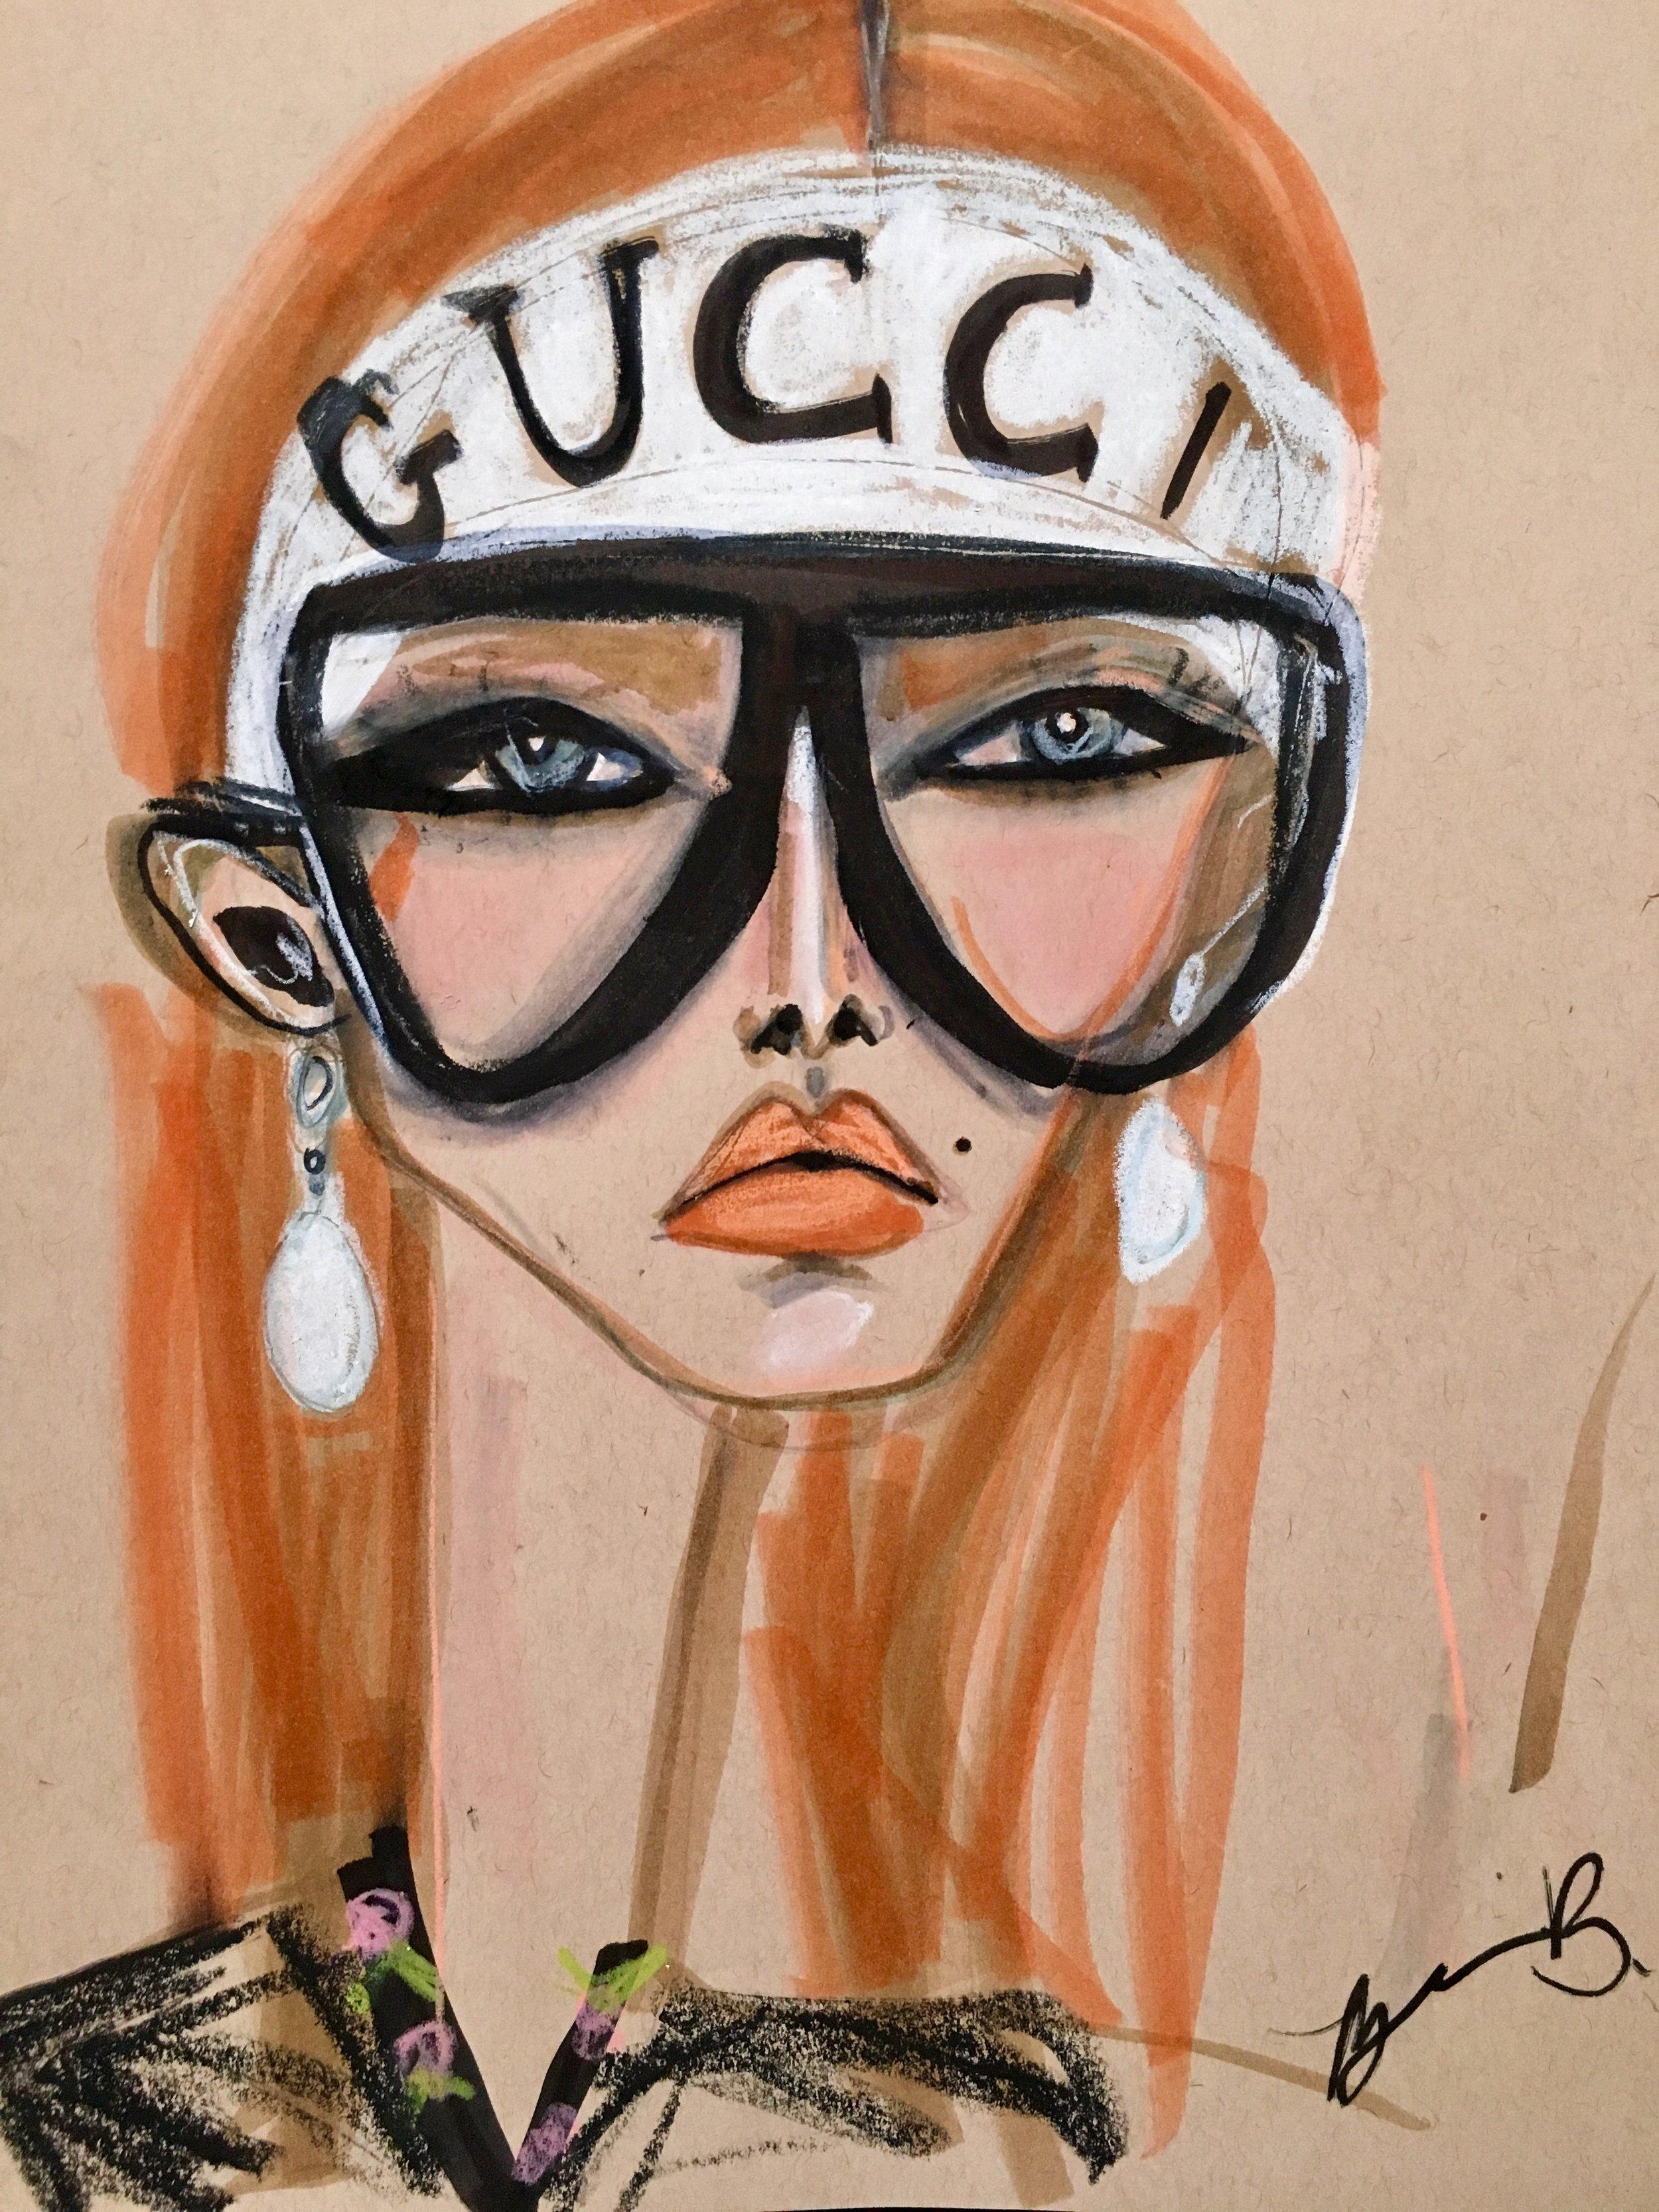 Gucci FW17